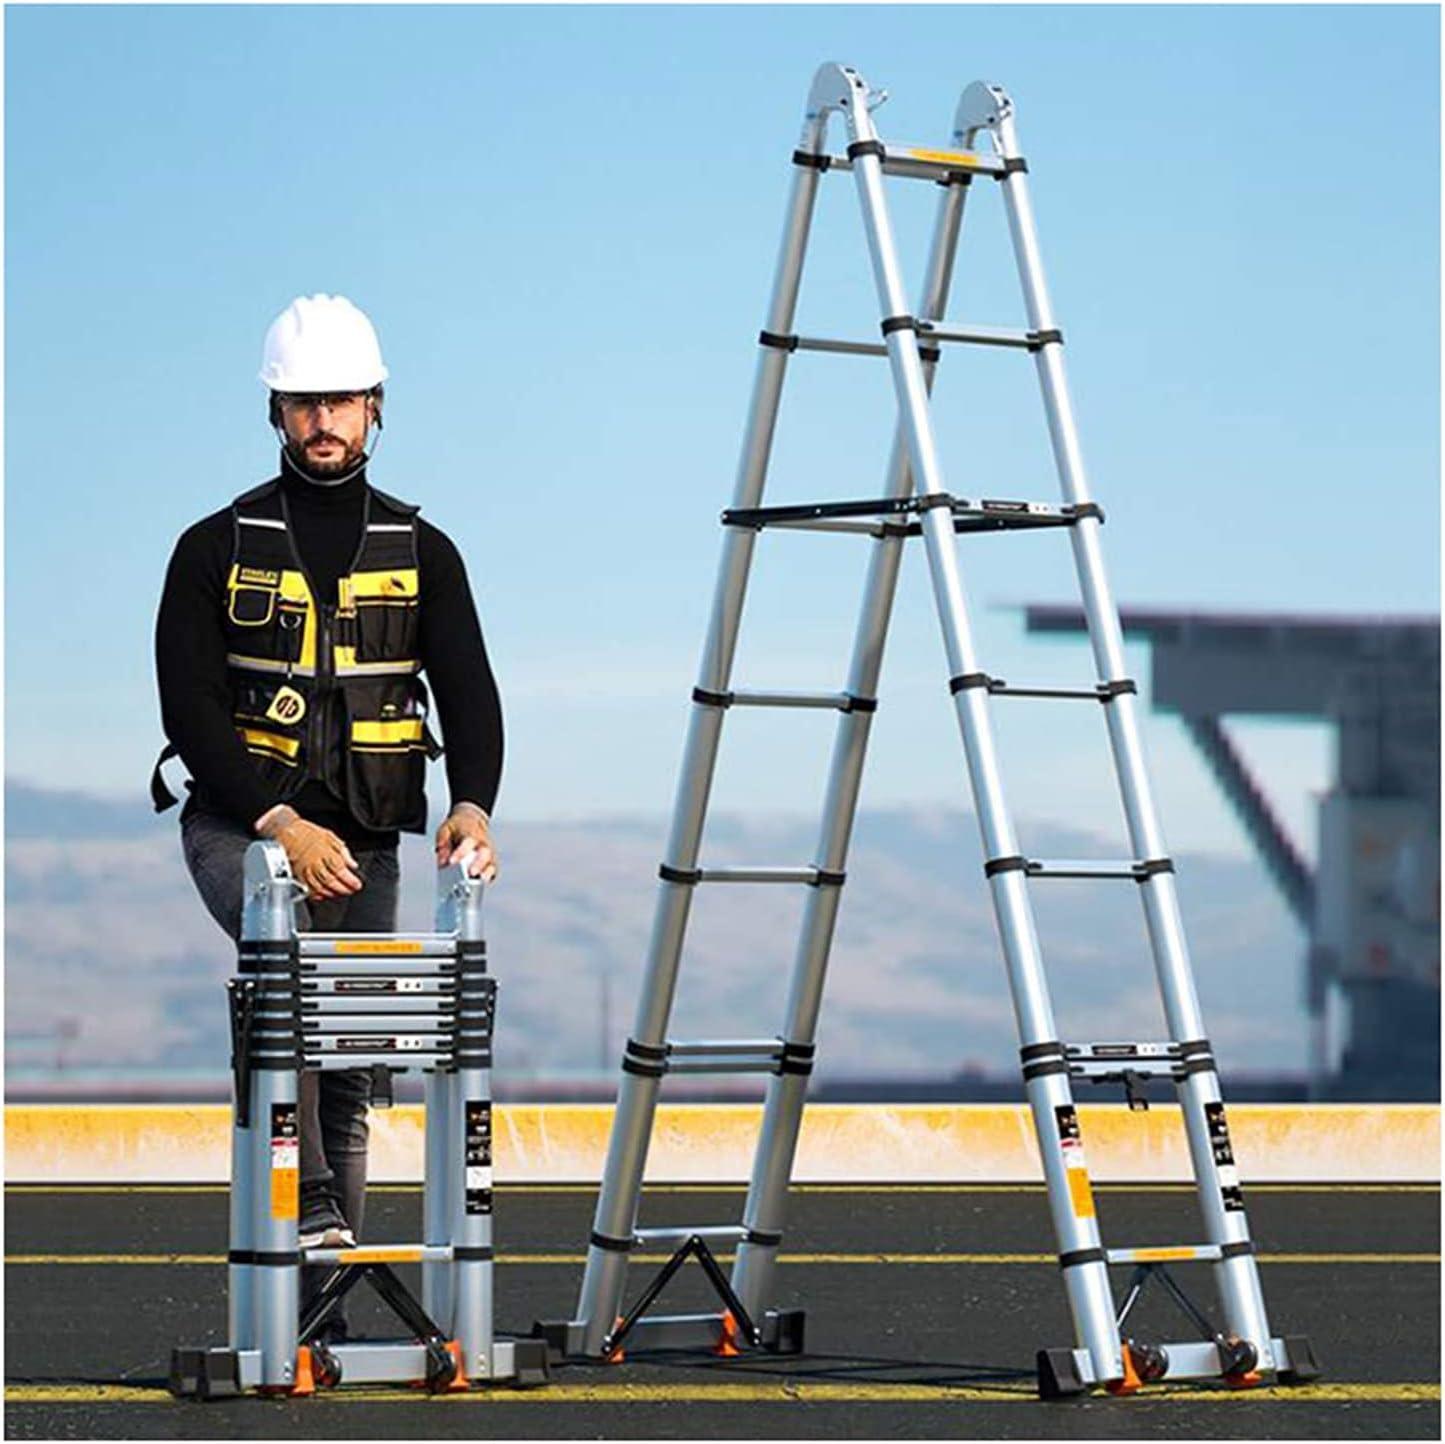 supreme HBSC Aluminum Telescopic Ladder Multi 70% OFF Outlet Folding Extension Purpose